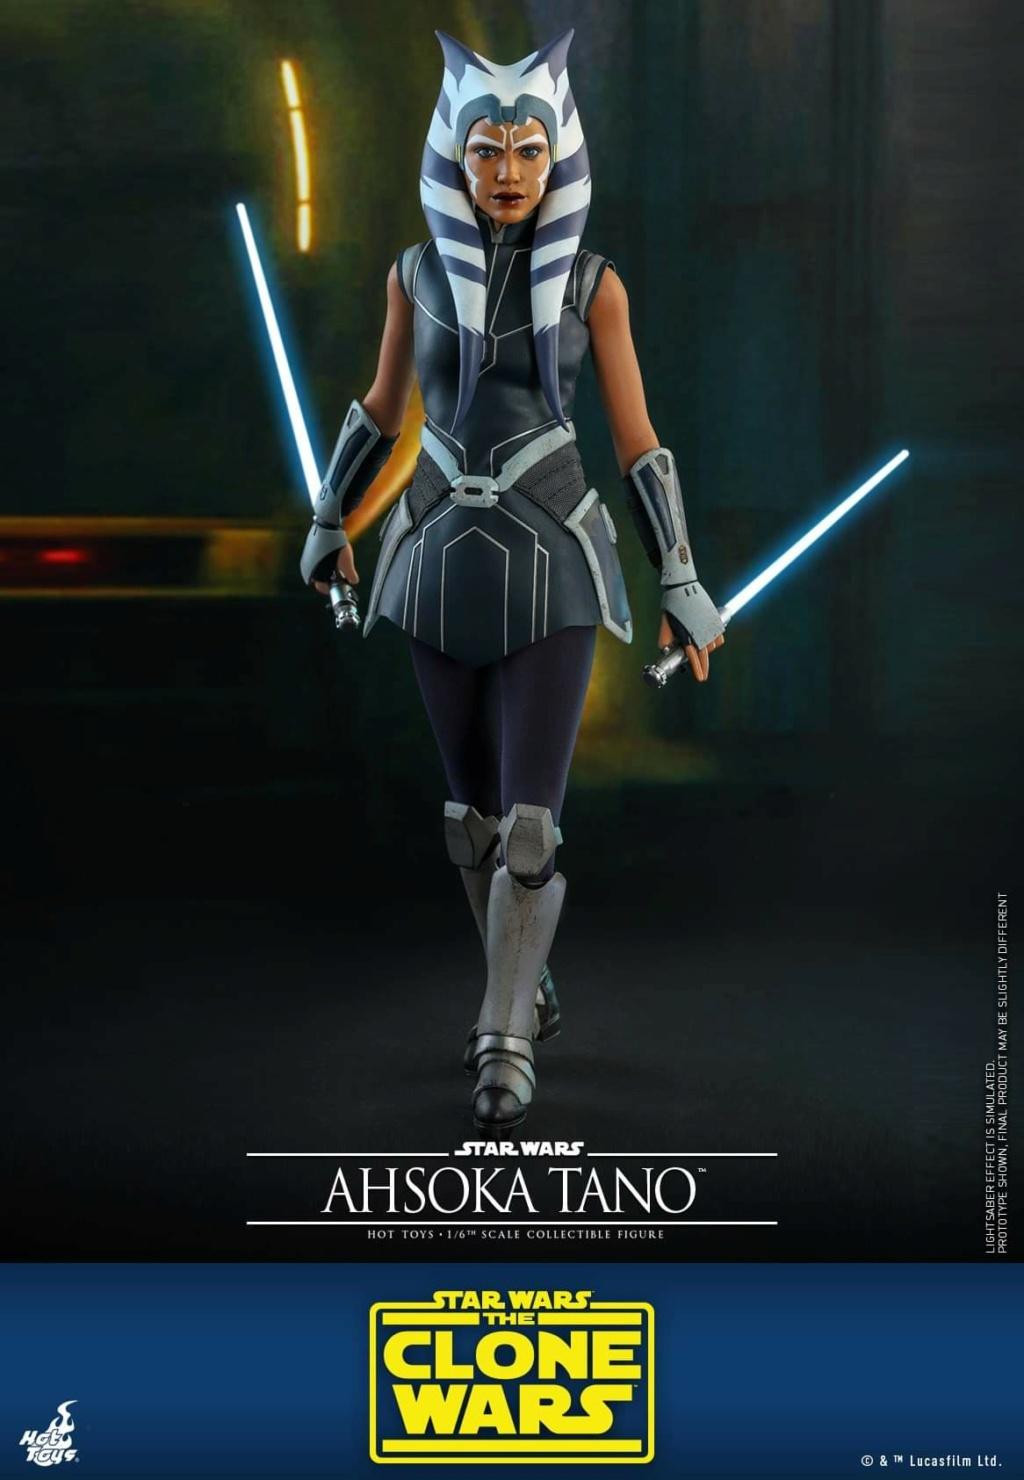 Ahsoka Tano - 1/6th scale - The Clone Wars - Hot Toys Fb_im138